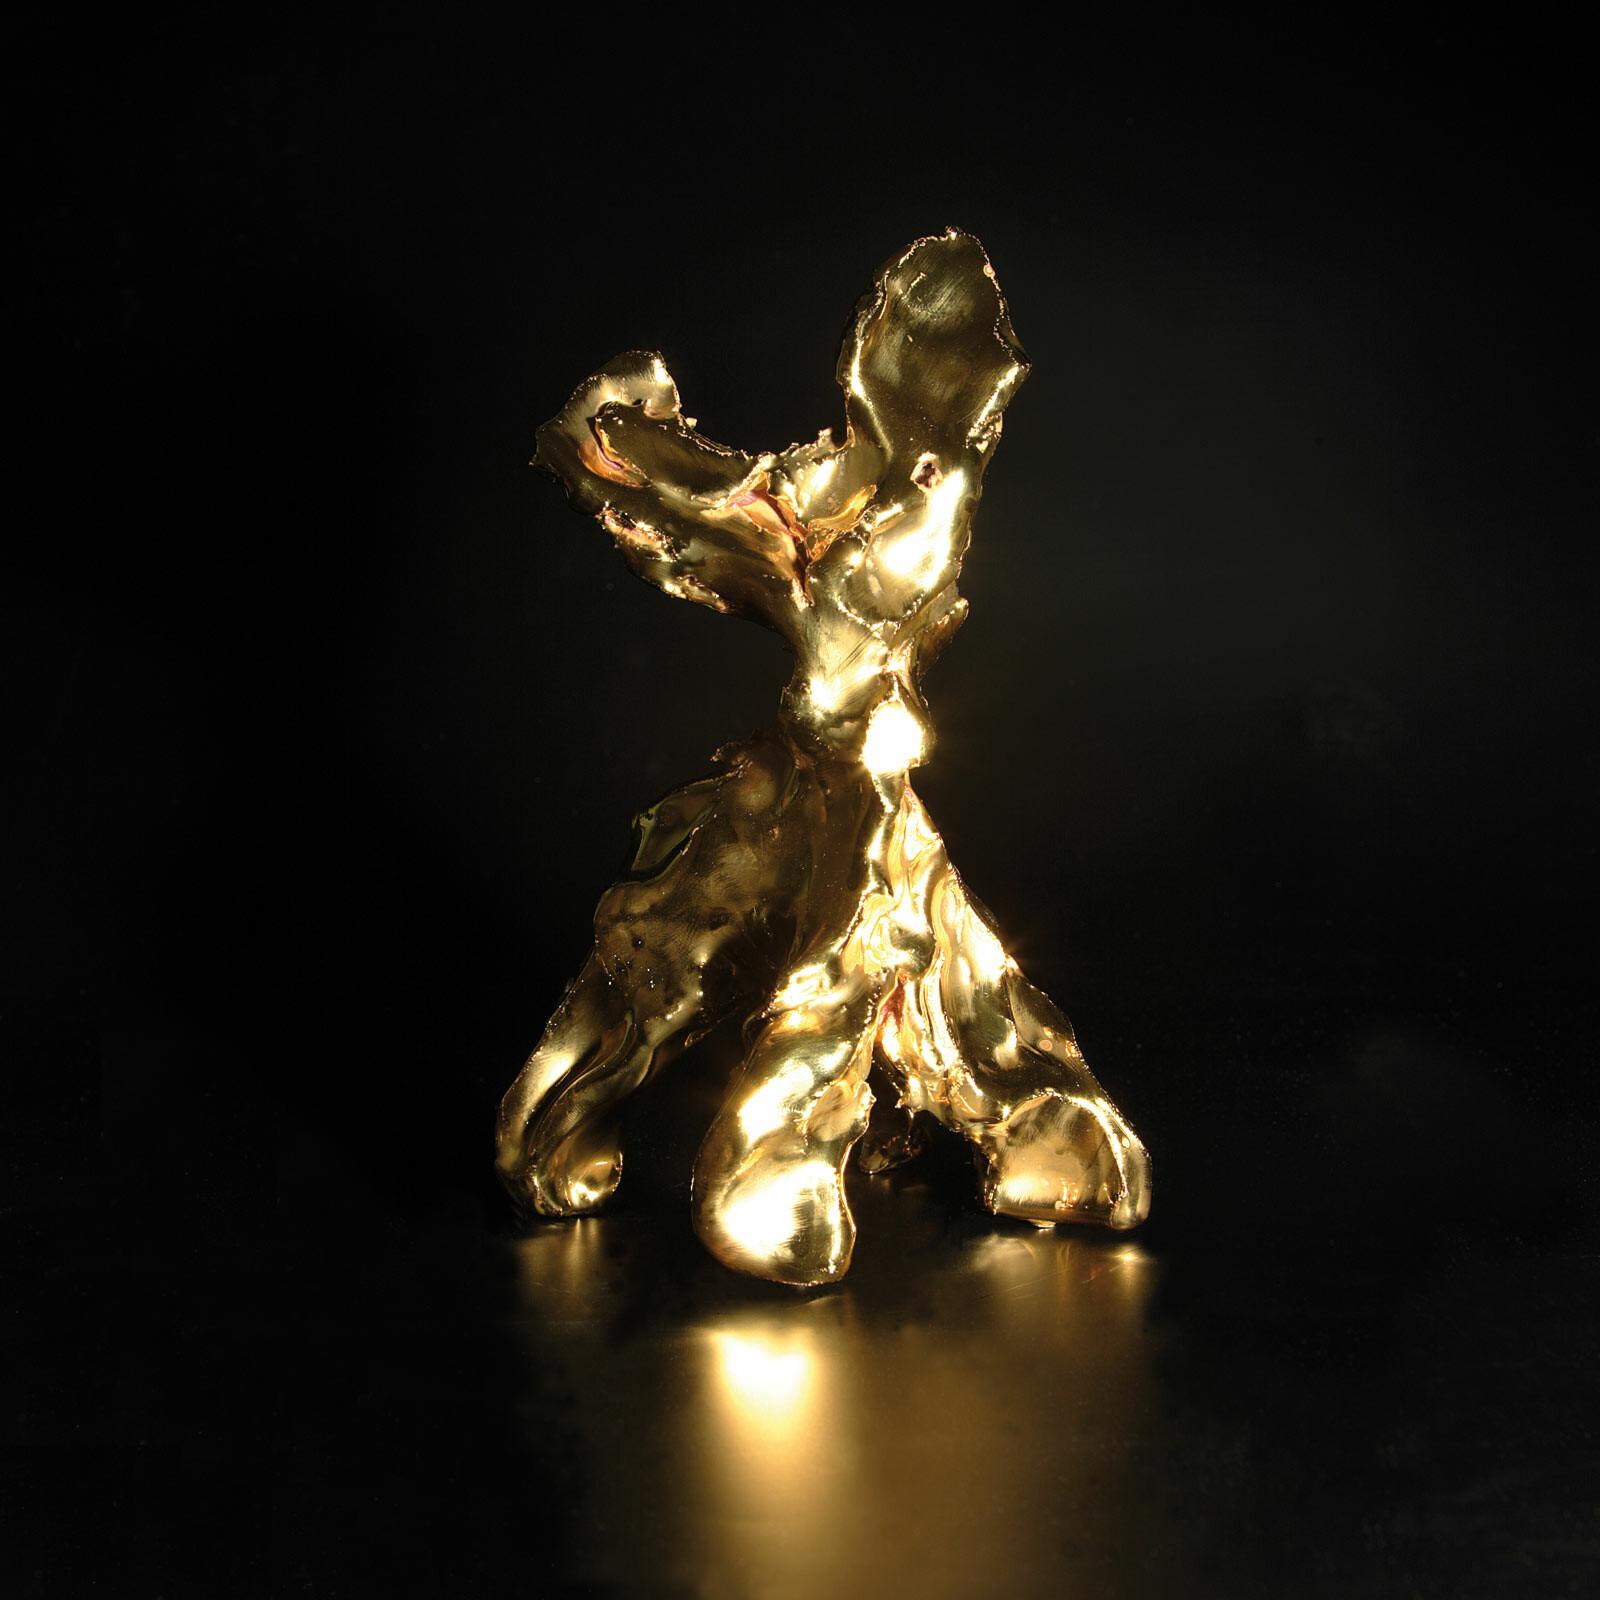 One Minute Sculpture - Marcel Wanders